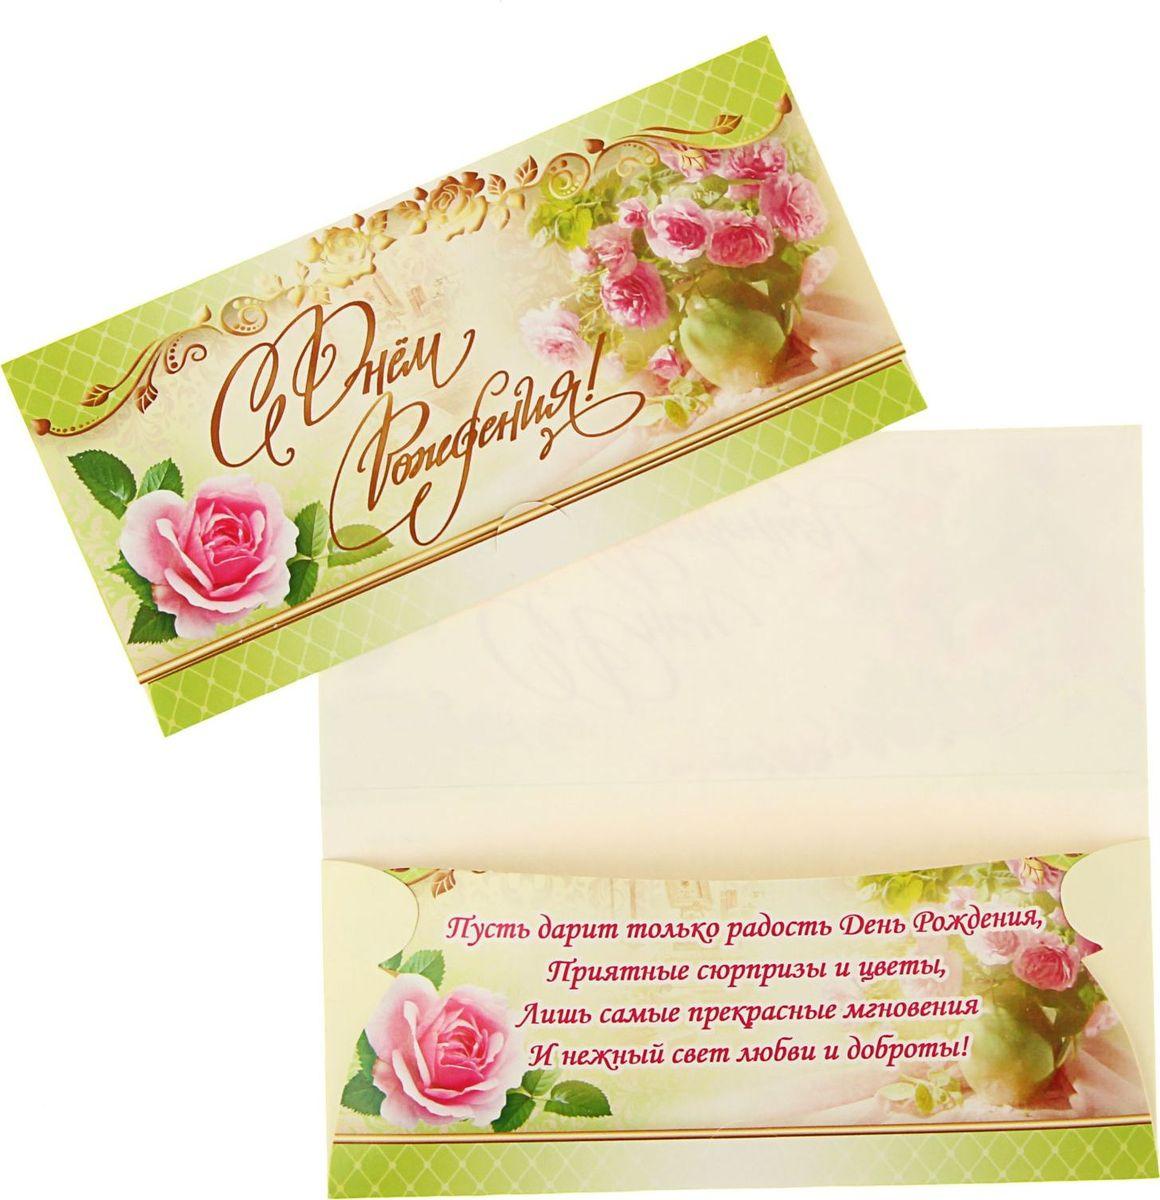 Картинки для дня рождения на конверте